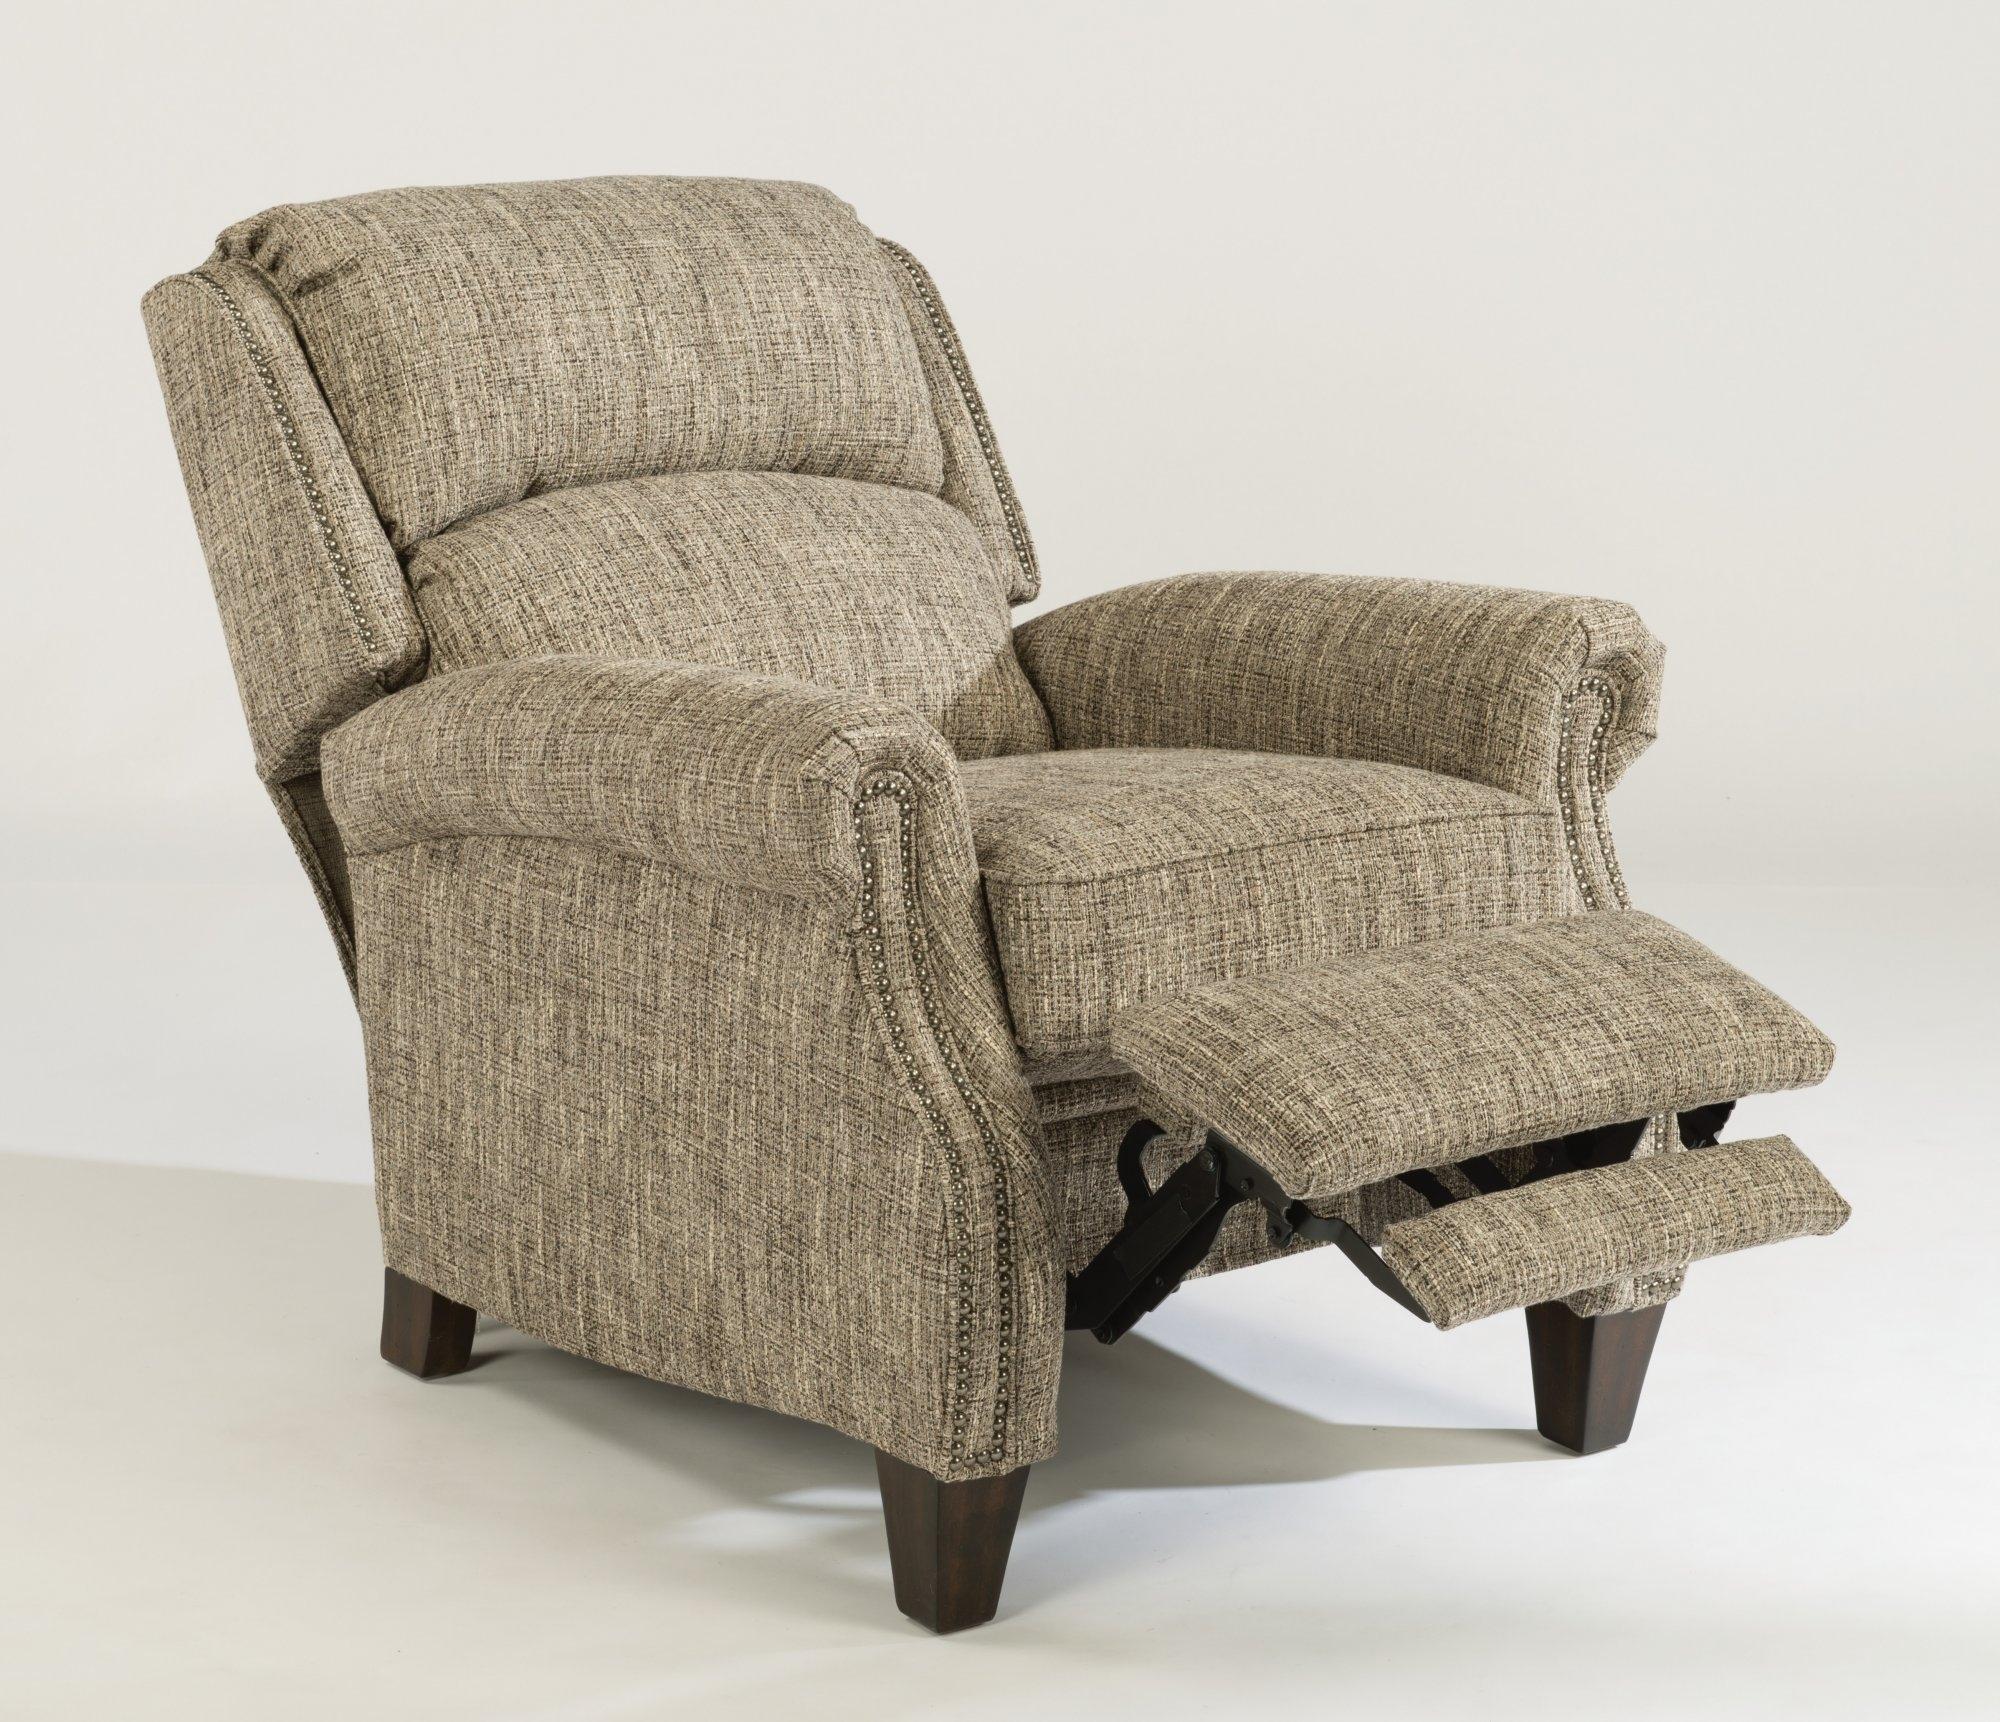 Ashley Furniture Madison: Ashley Furniture High Leg Recliners